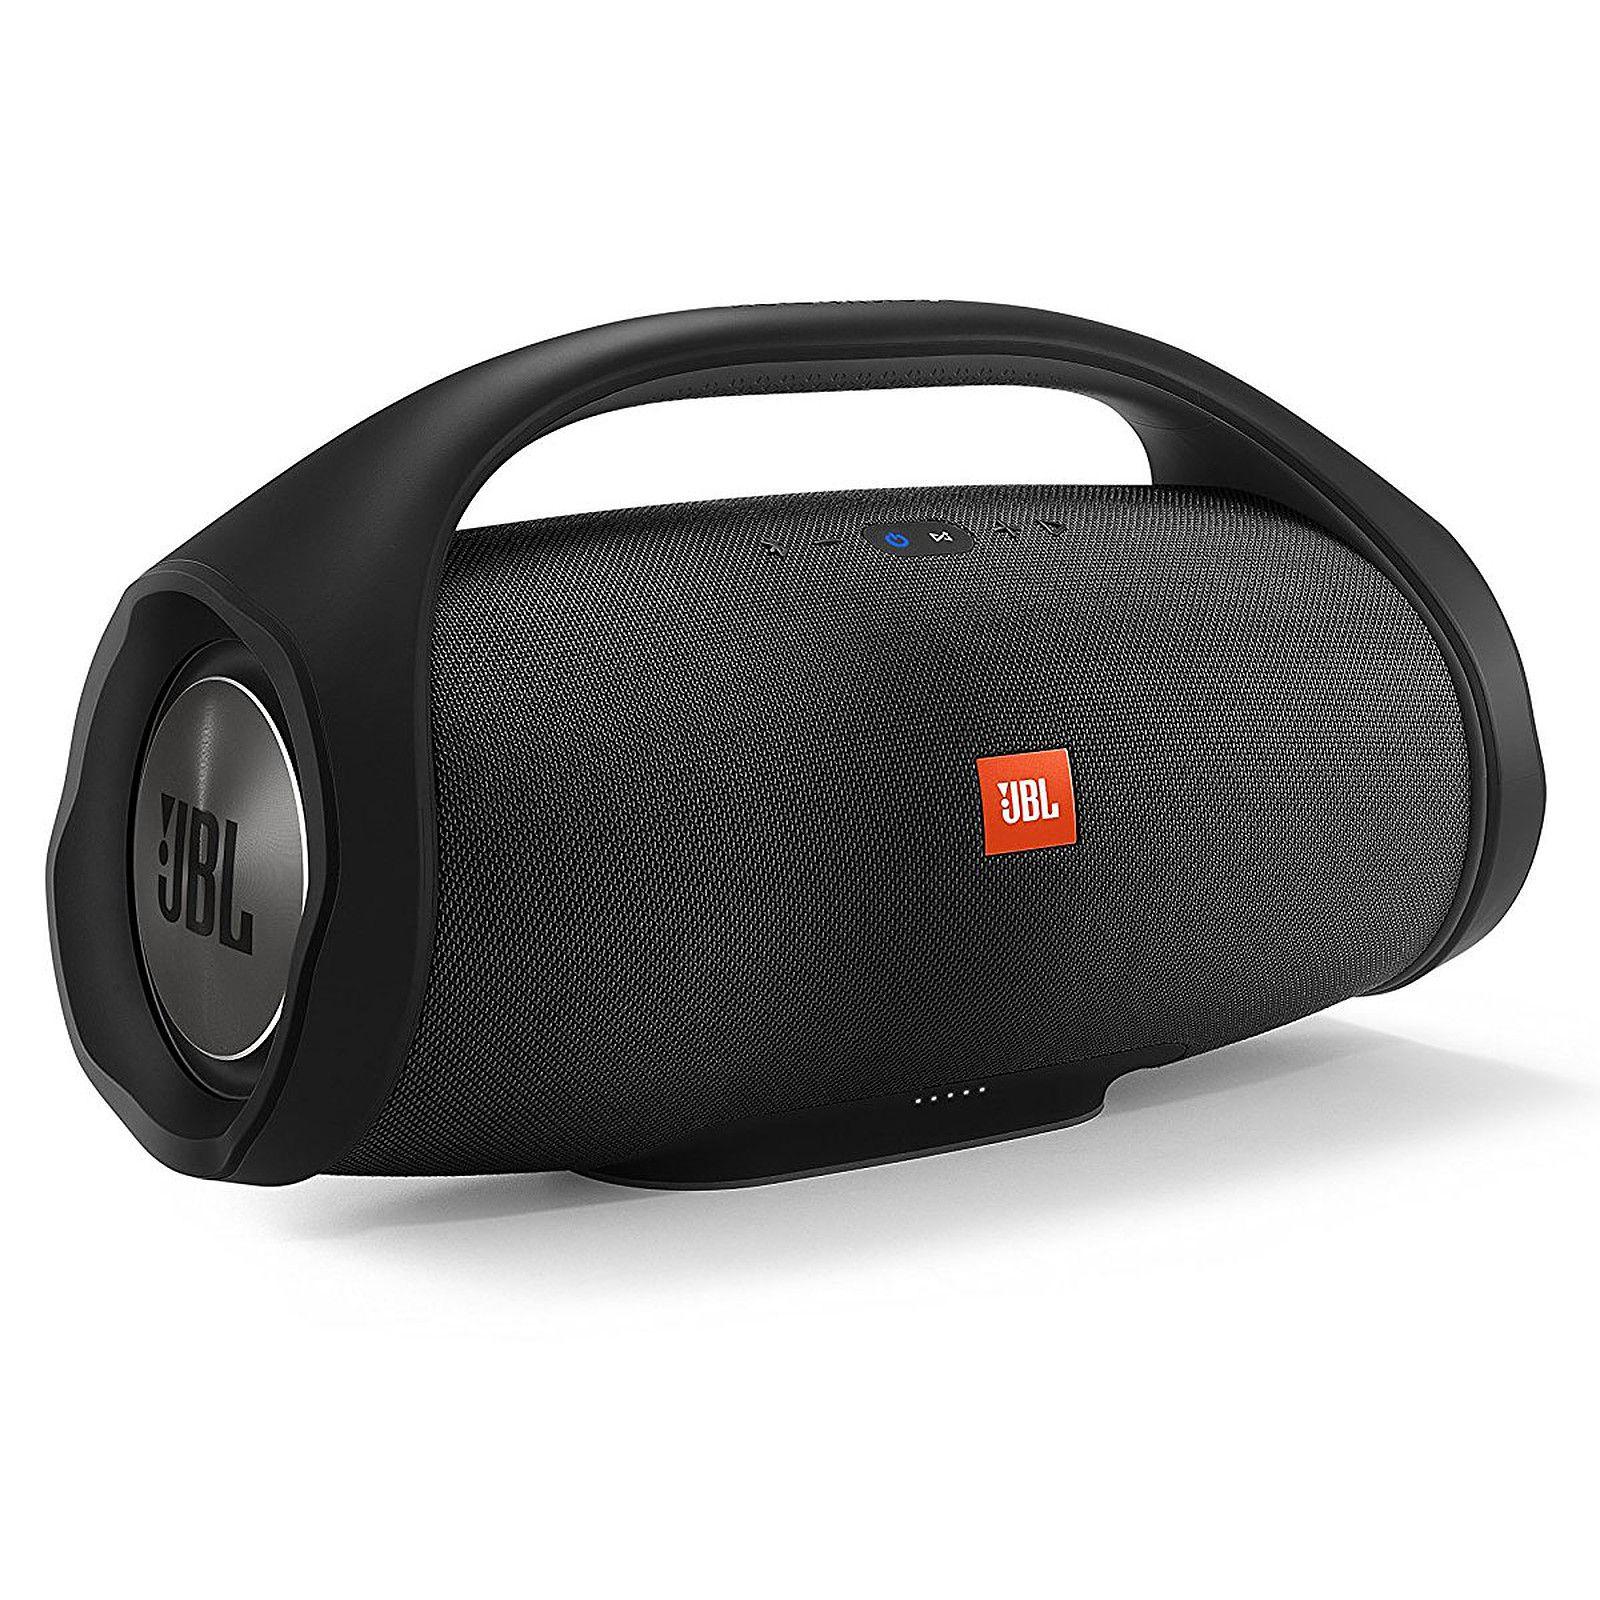 JBL Boombox - Bluetooth Lautsprecher (24h Akku, IPX7 Wasserdicht, JBL Connect, 2x USB Output)